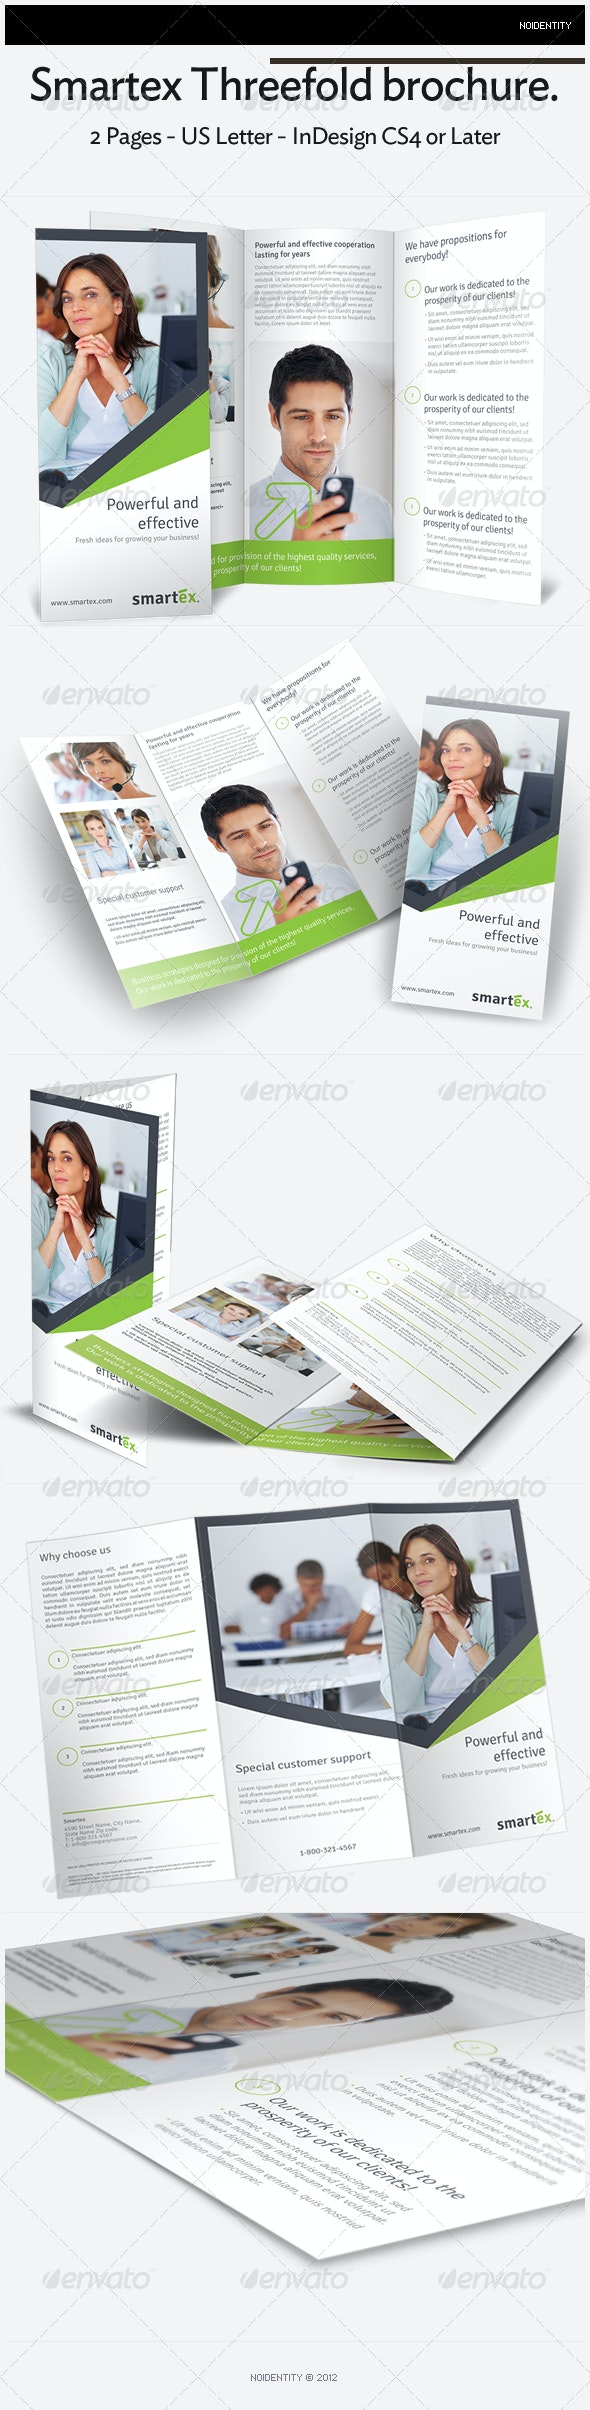 Smartex Threefold Brochure - Brochures Print Templates